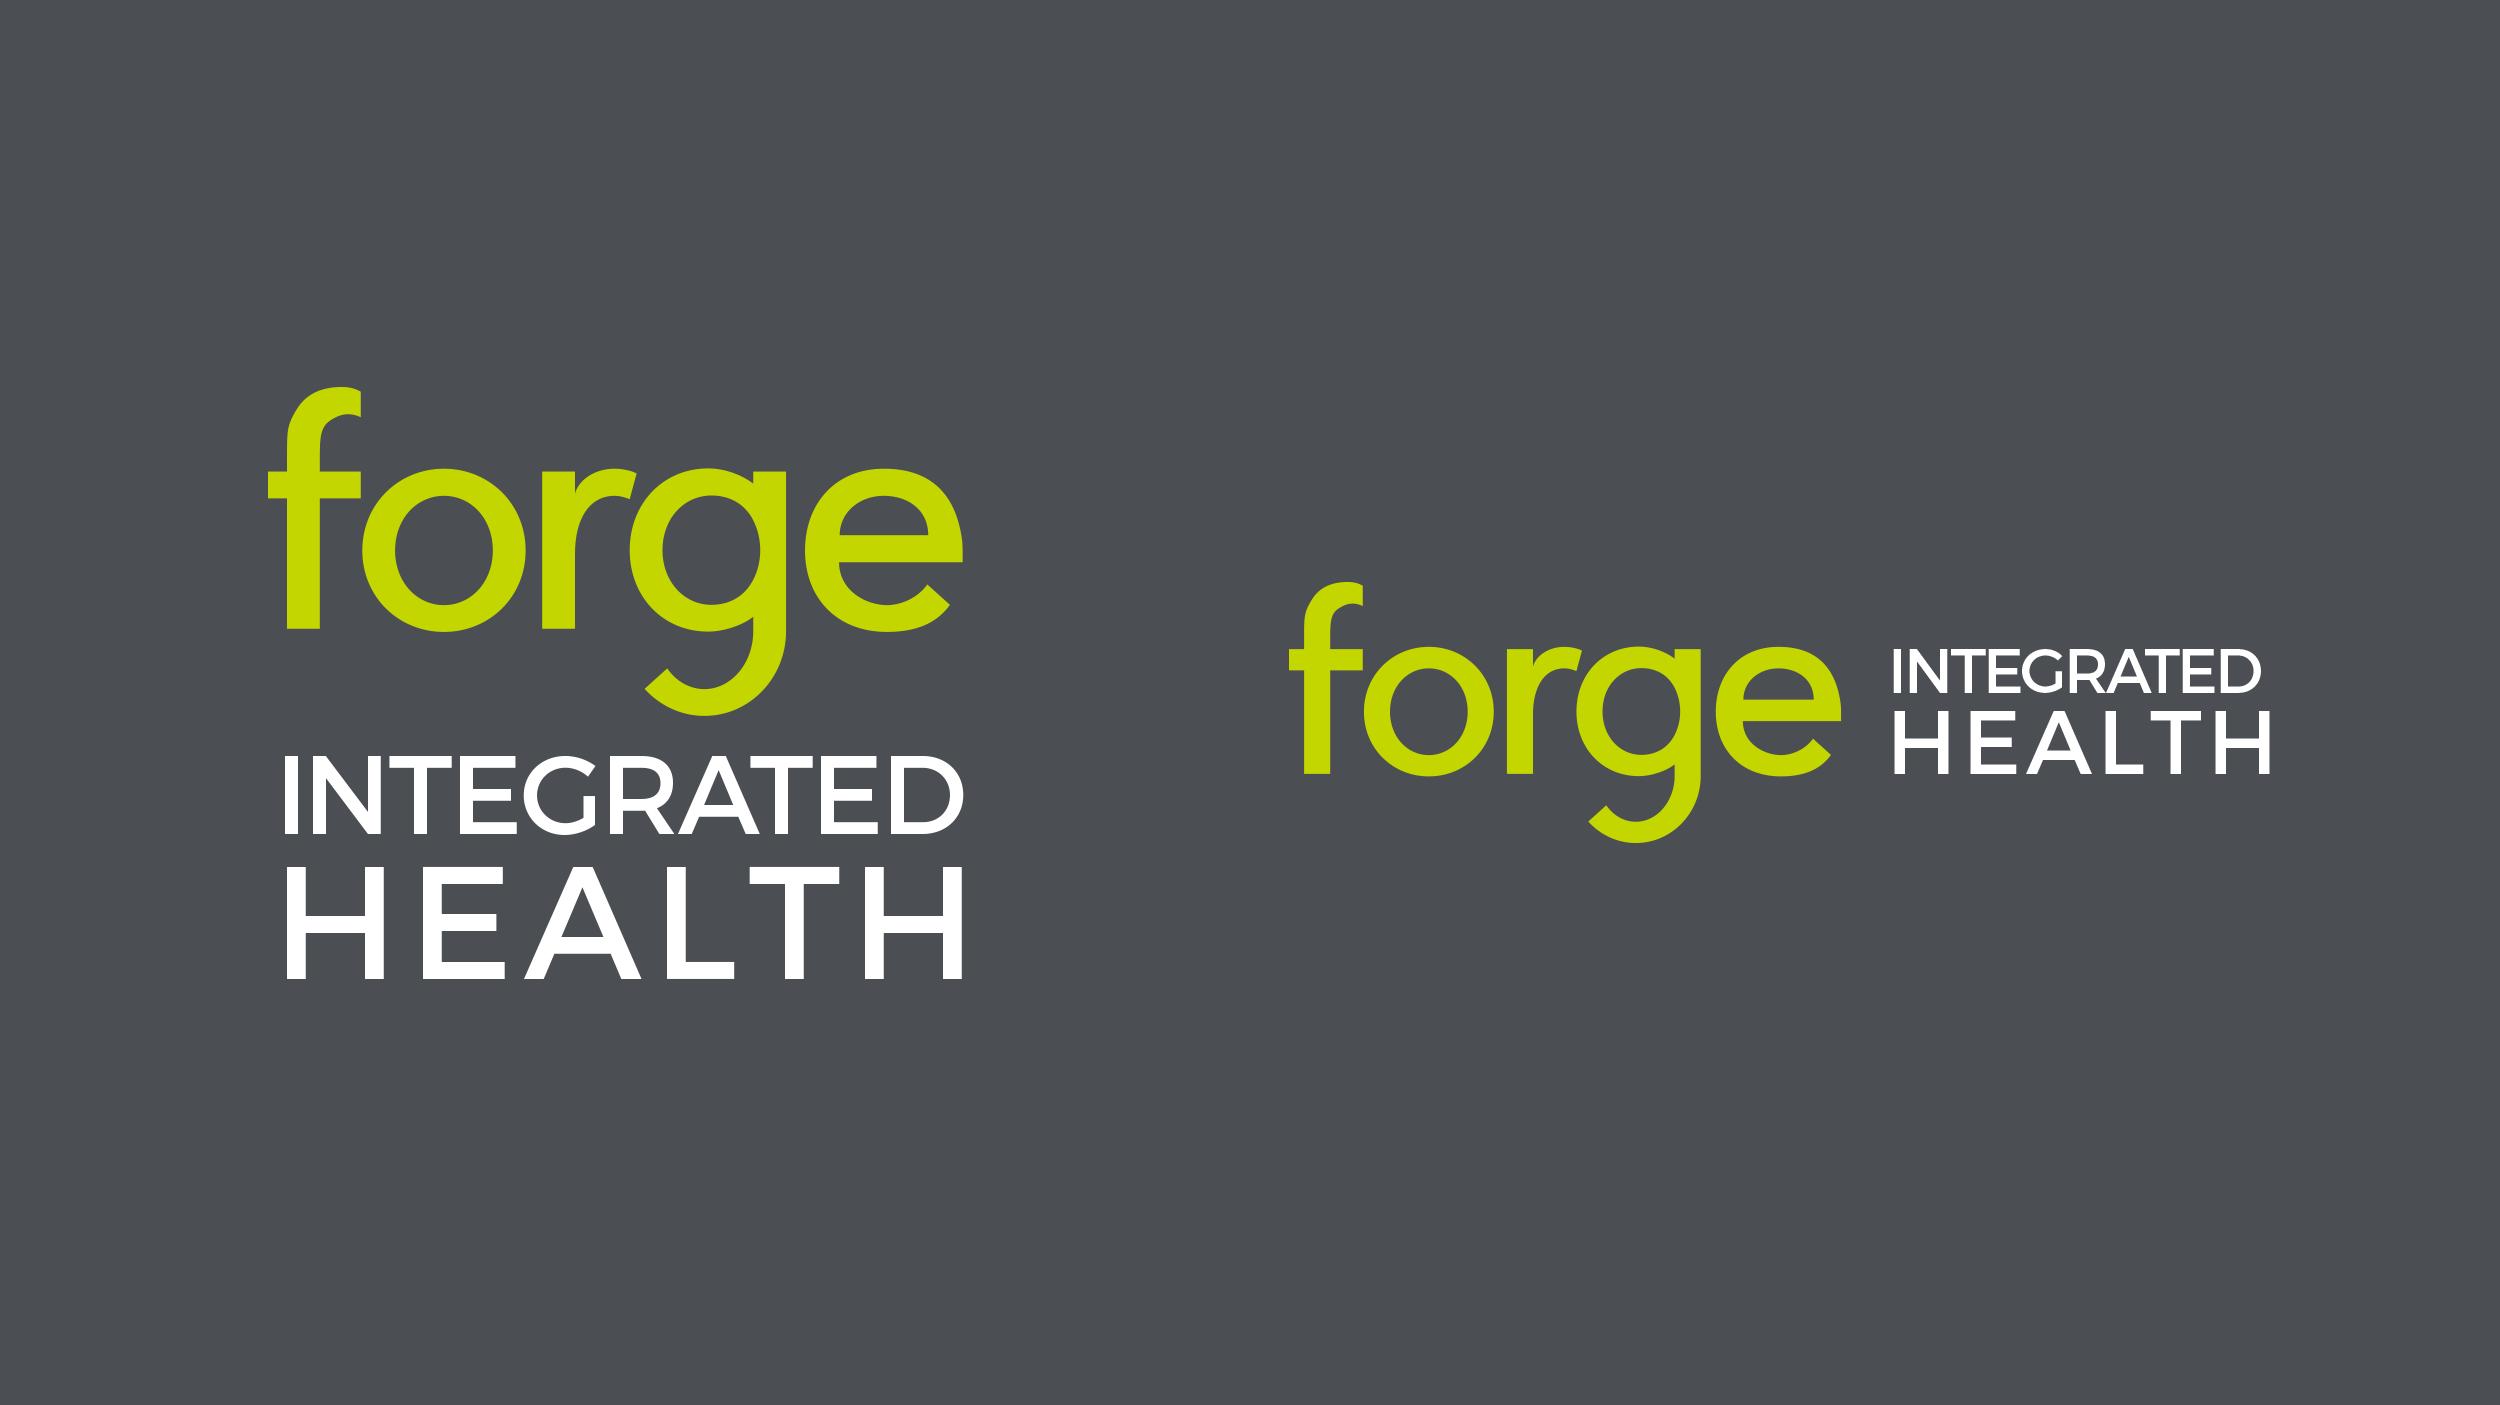 katelynbishop_design_forge_logo2